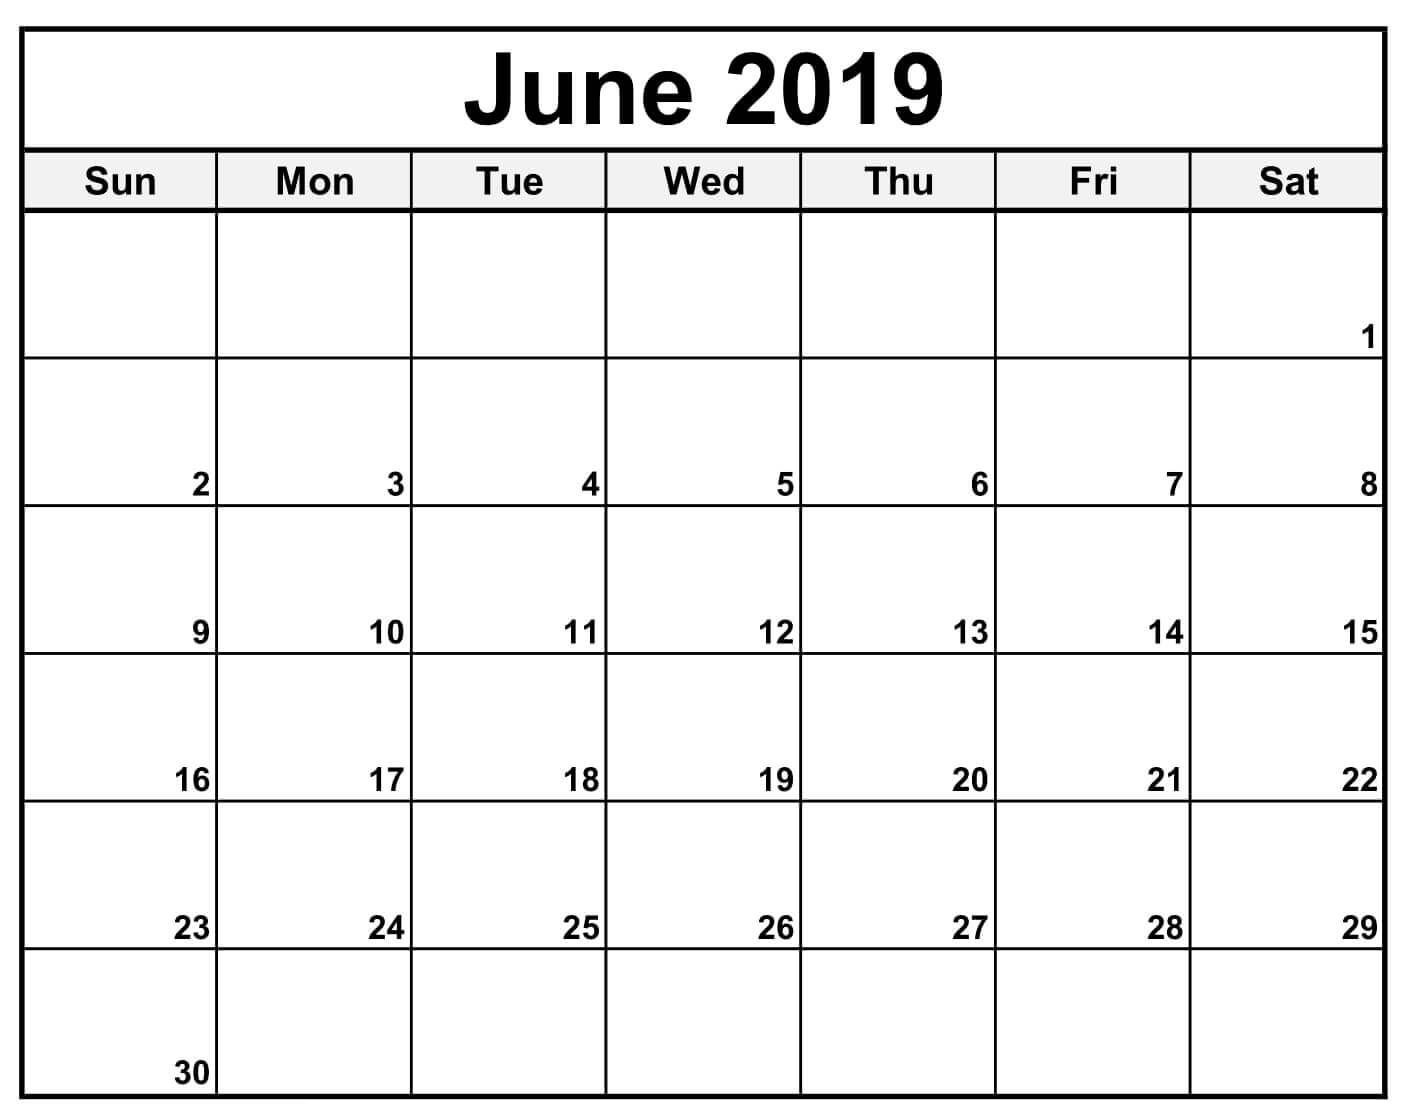 Blank Calendar For June 2019 Printable Template Fillable With Notes for Calendar Template Fillable Pdf